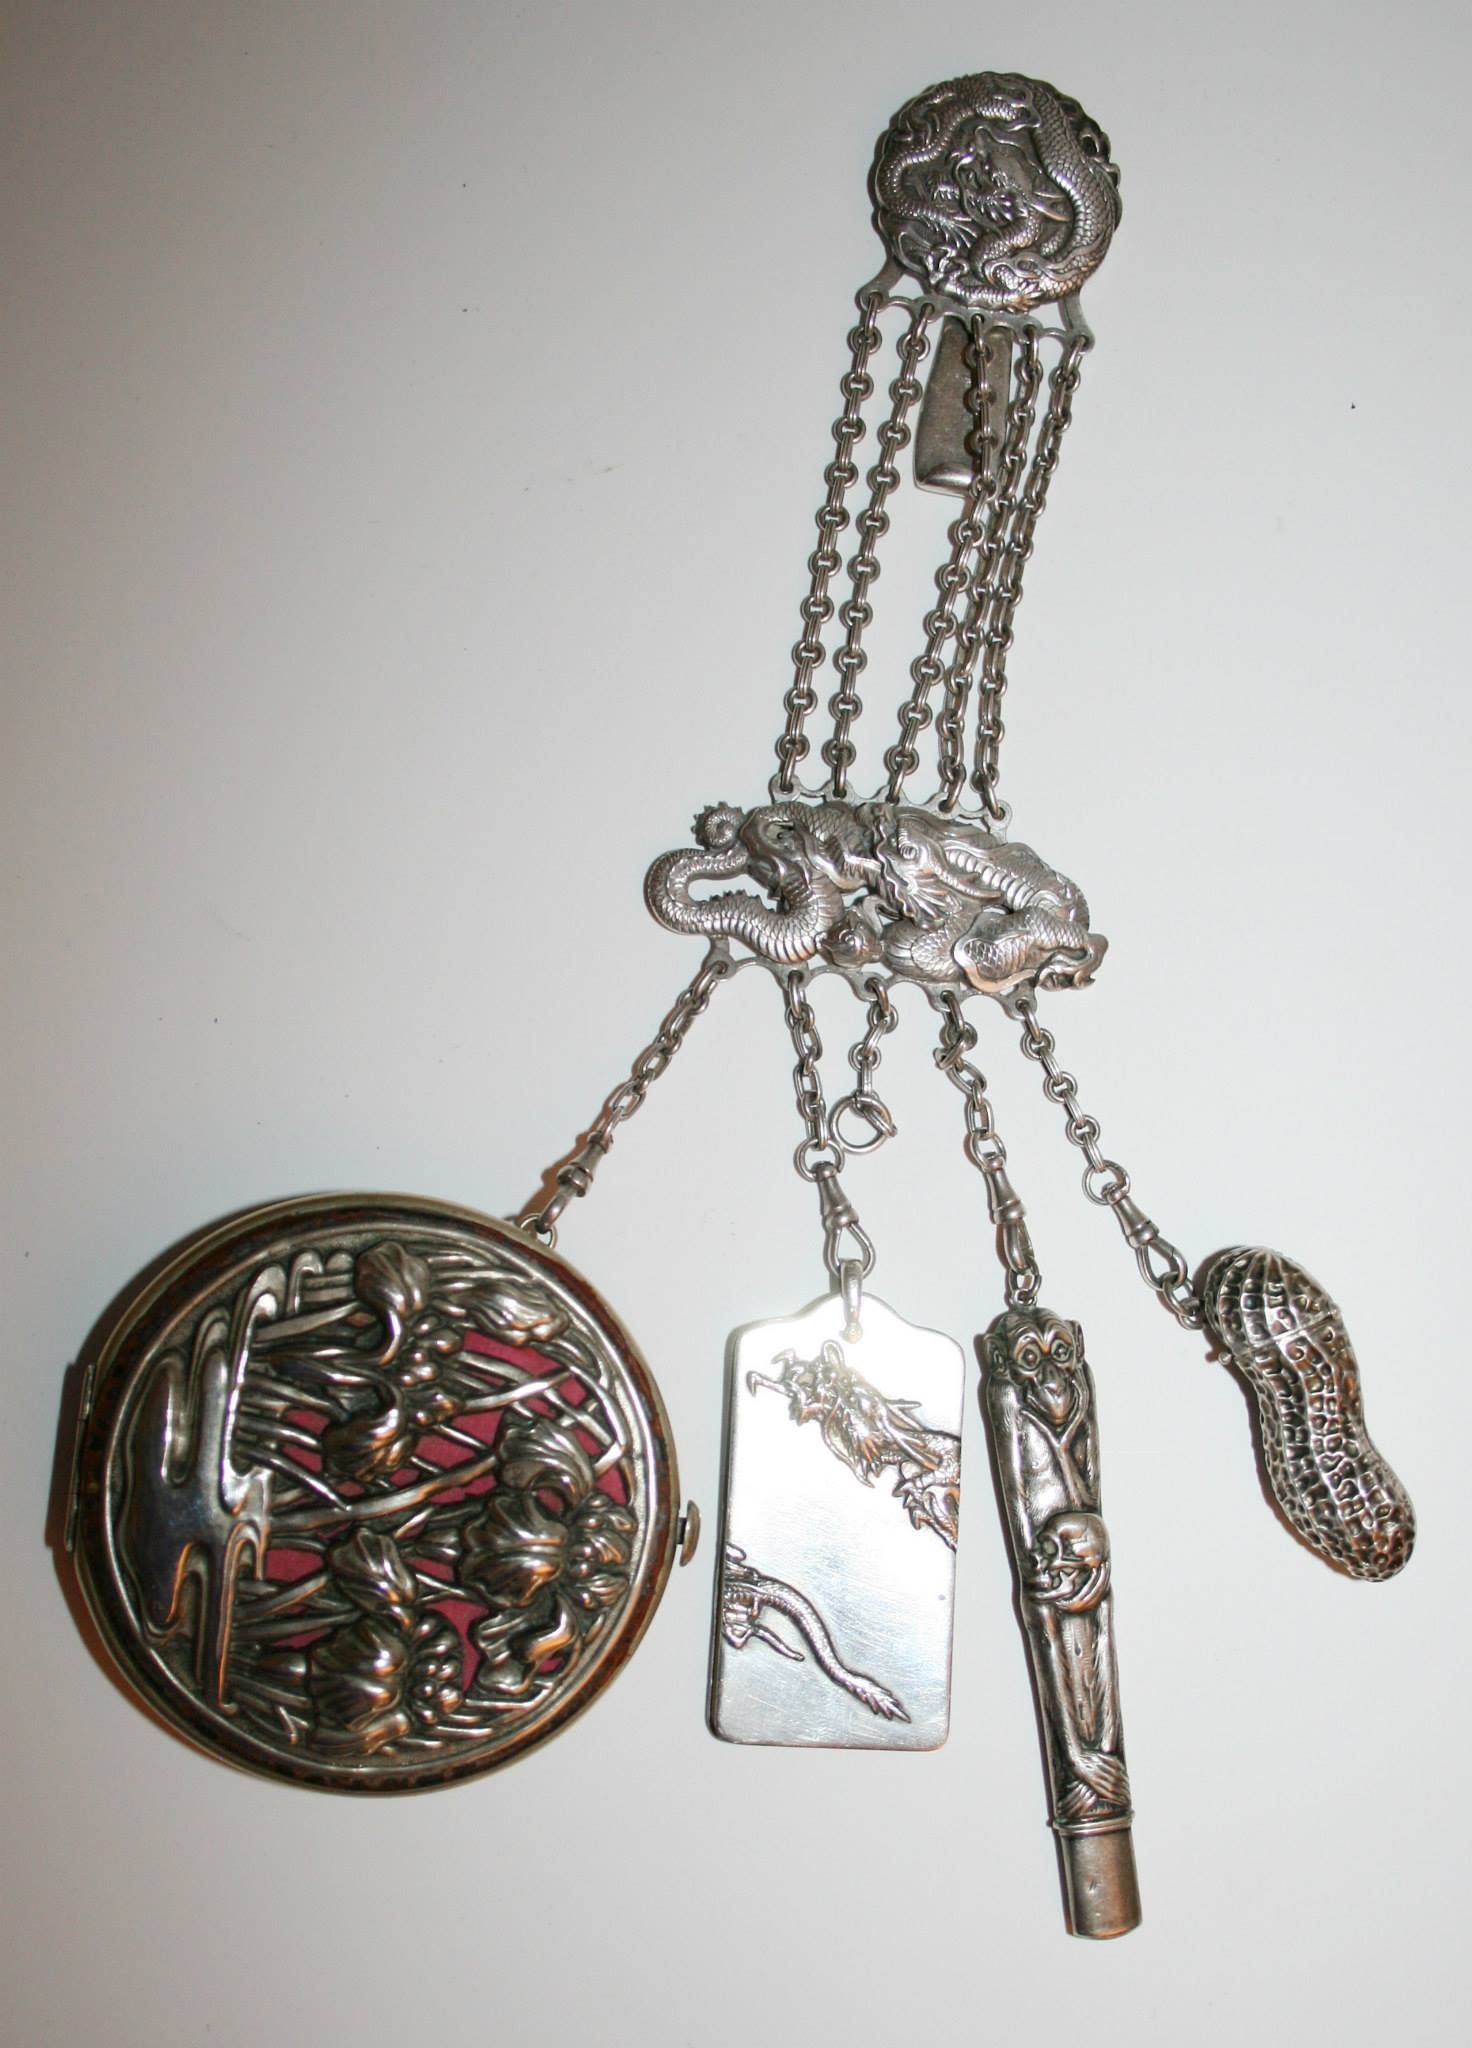 Japonisme sterling silver chatelaine